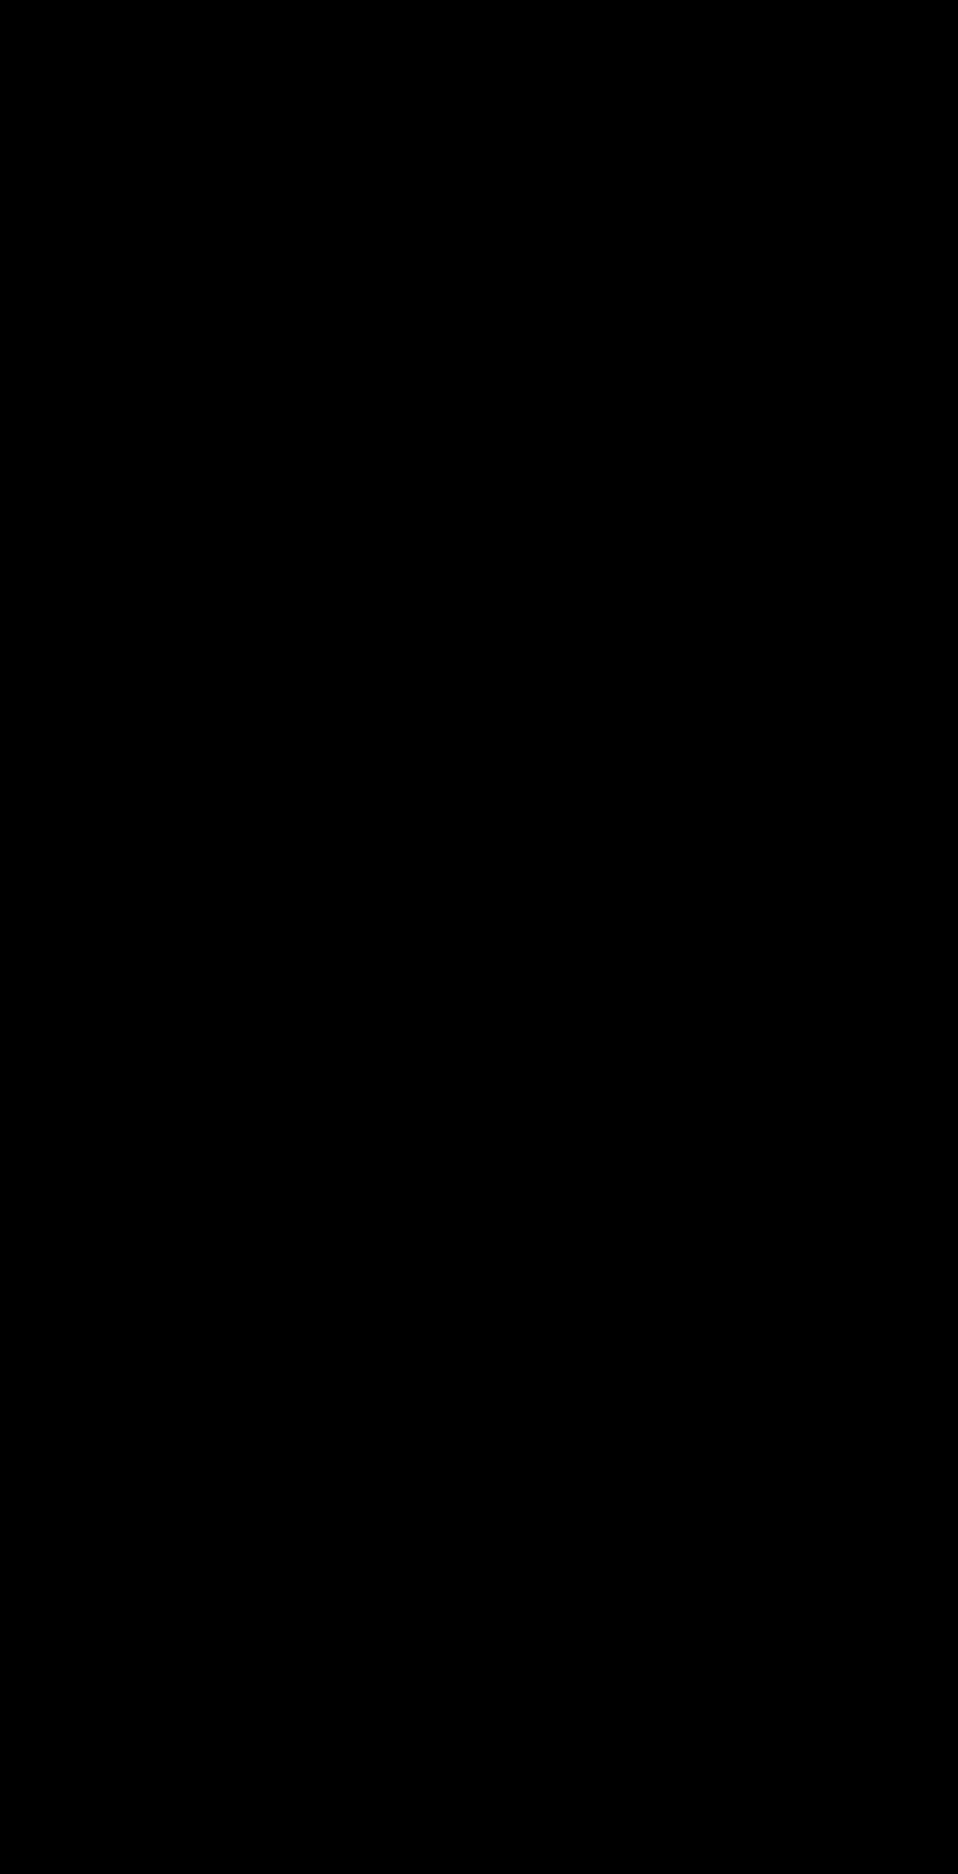 cemetary